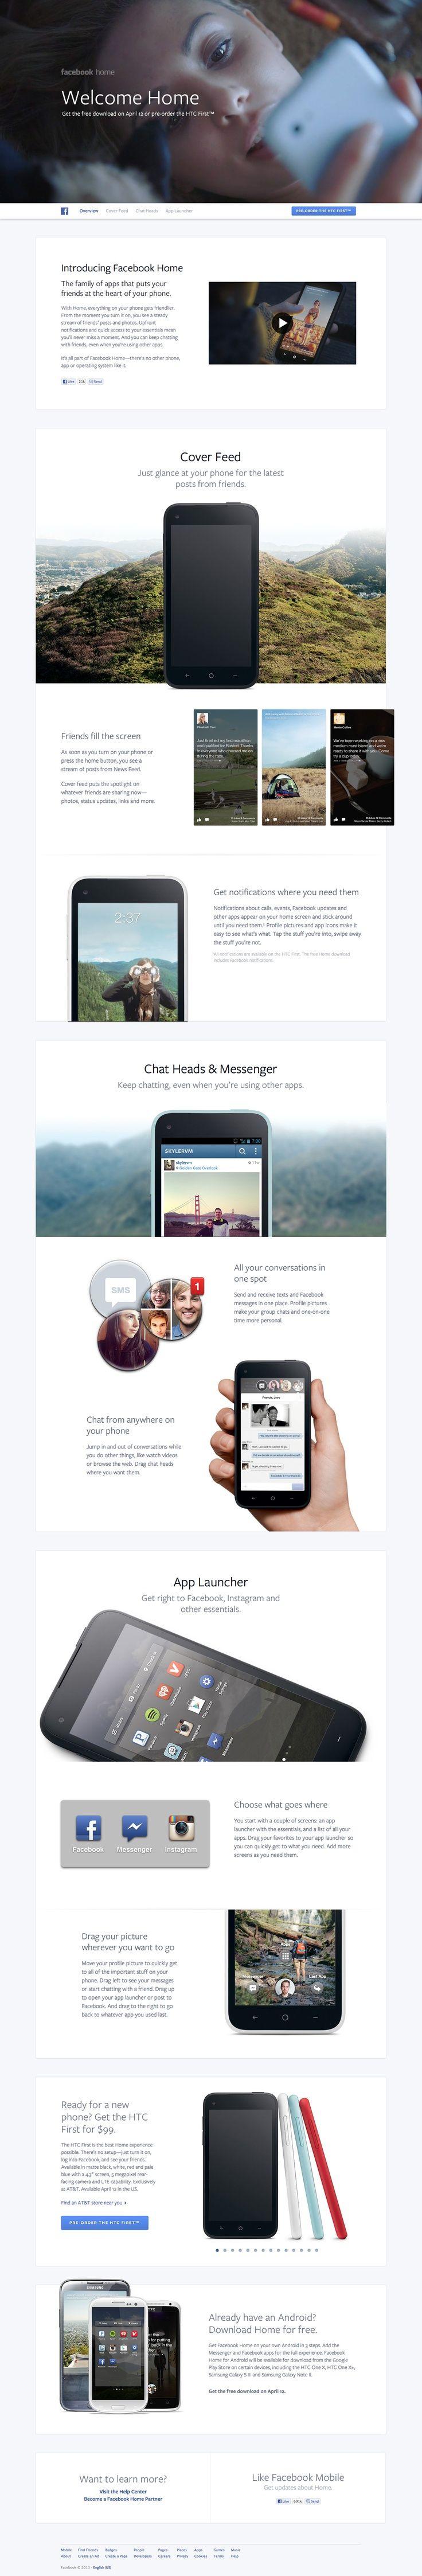 Web Design Layouts Inspiration Landing Pages Facebook Home Web Layout Design Web Design Inspiration Best Web Design